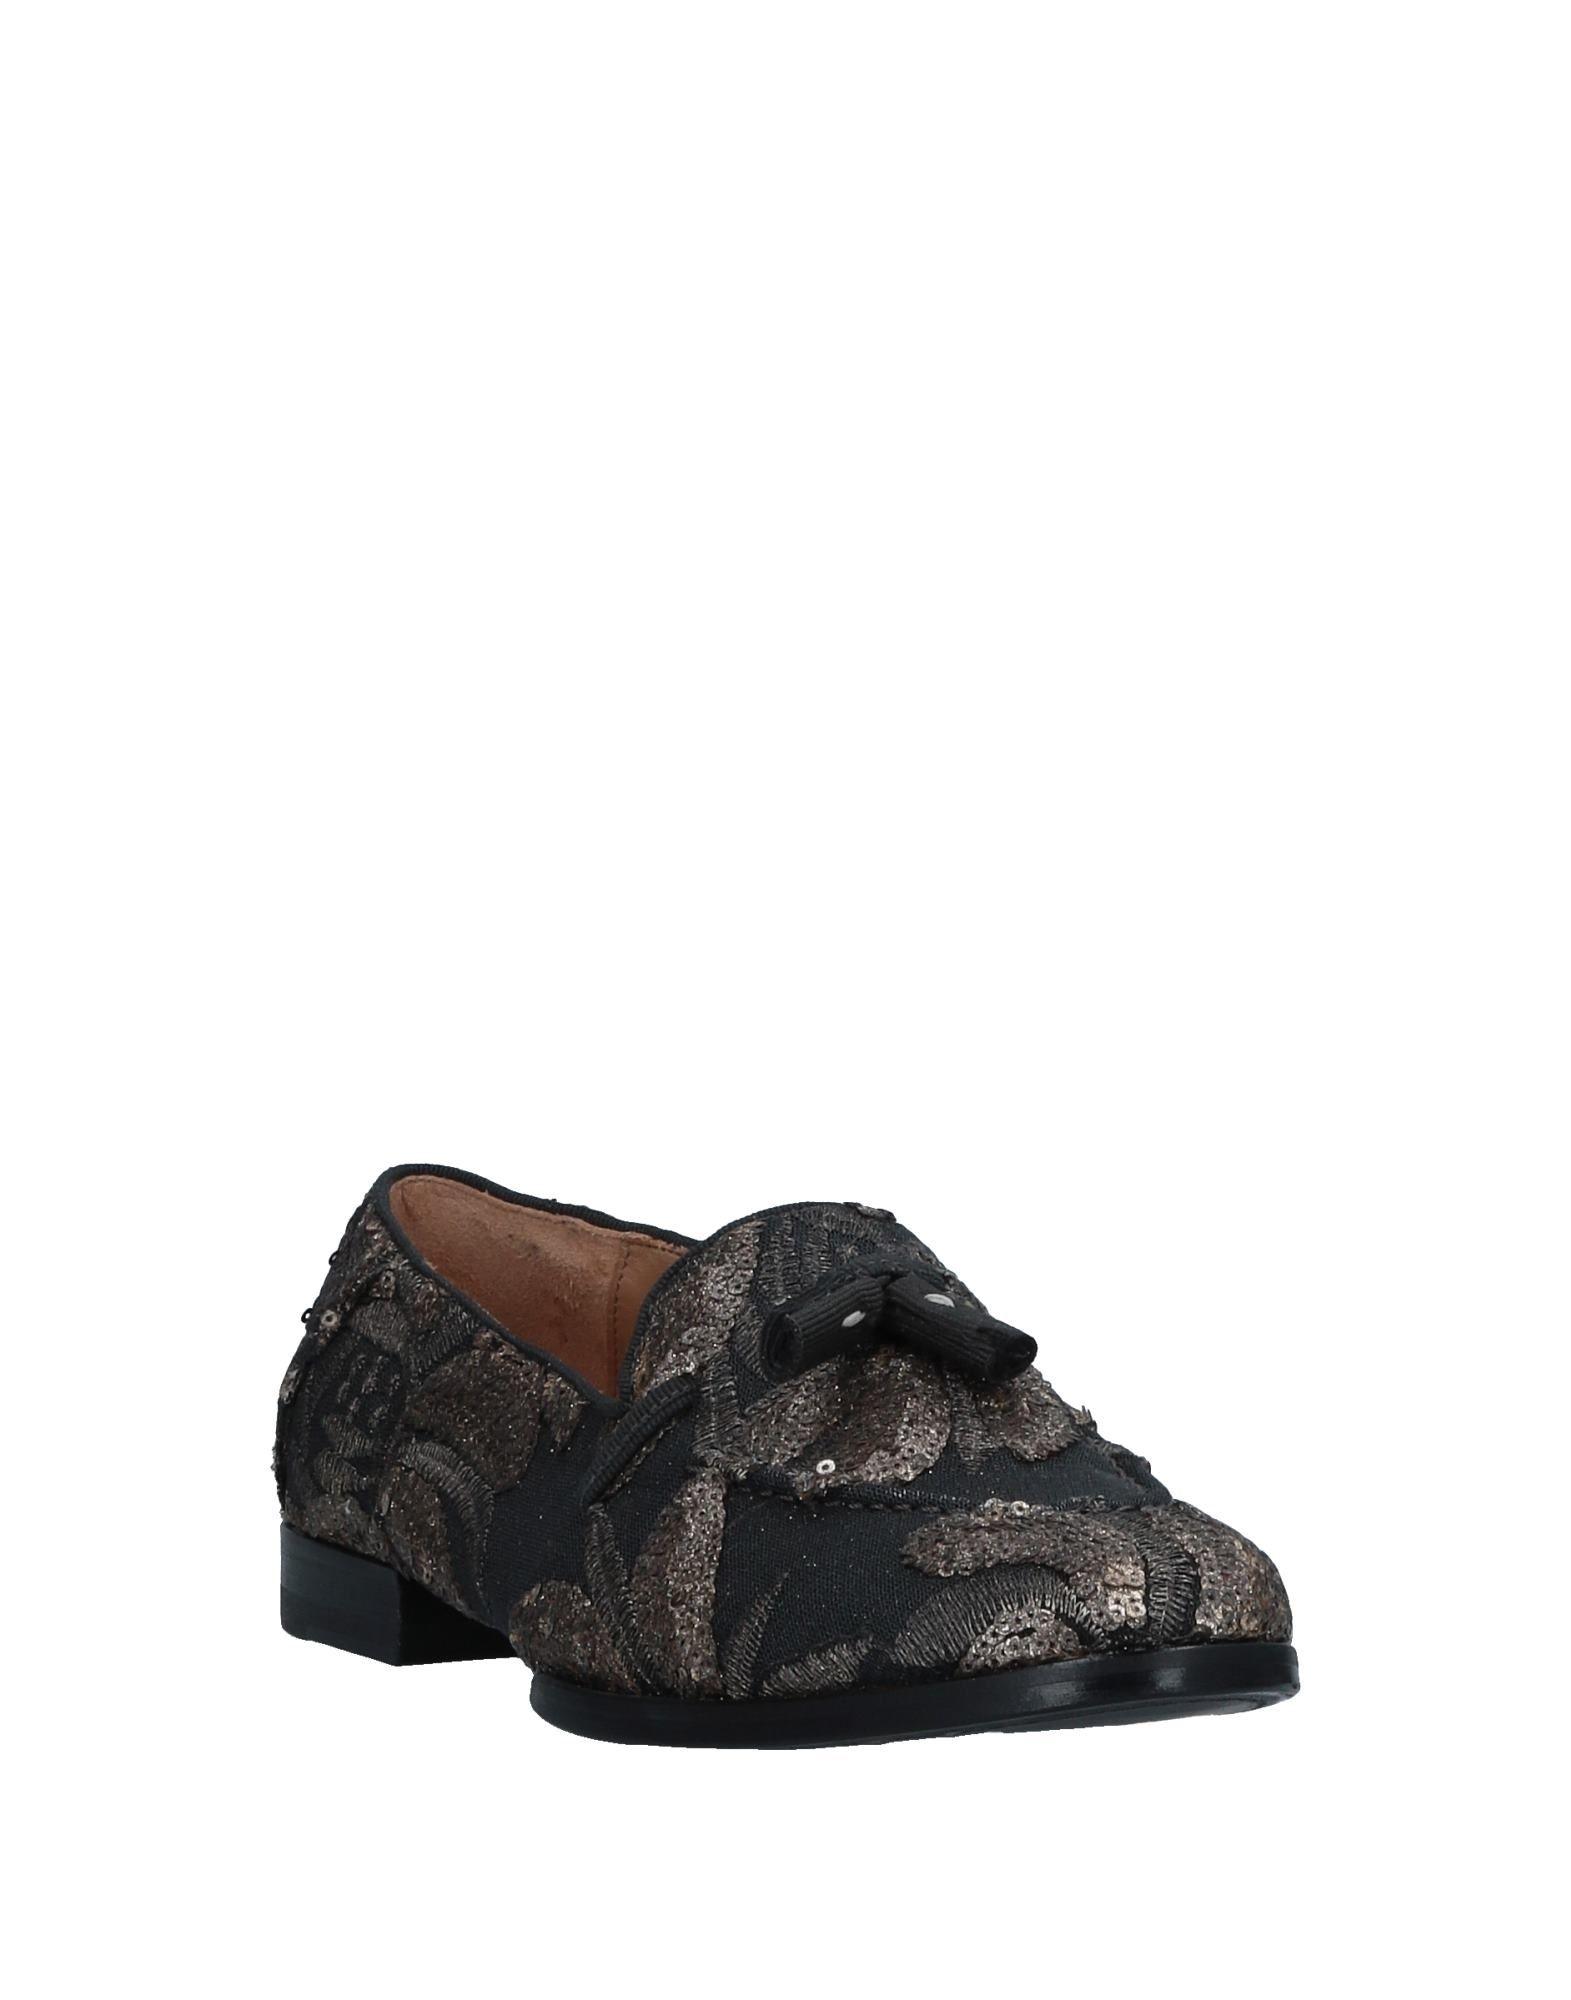 Stilvolle billige Mokassins Schuhe G Di G Mokassins billige Damen  11533889AU 9d37cb